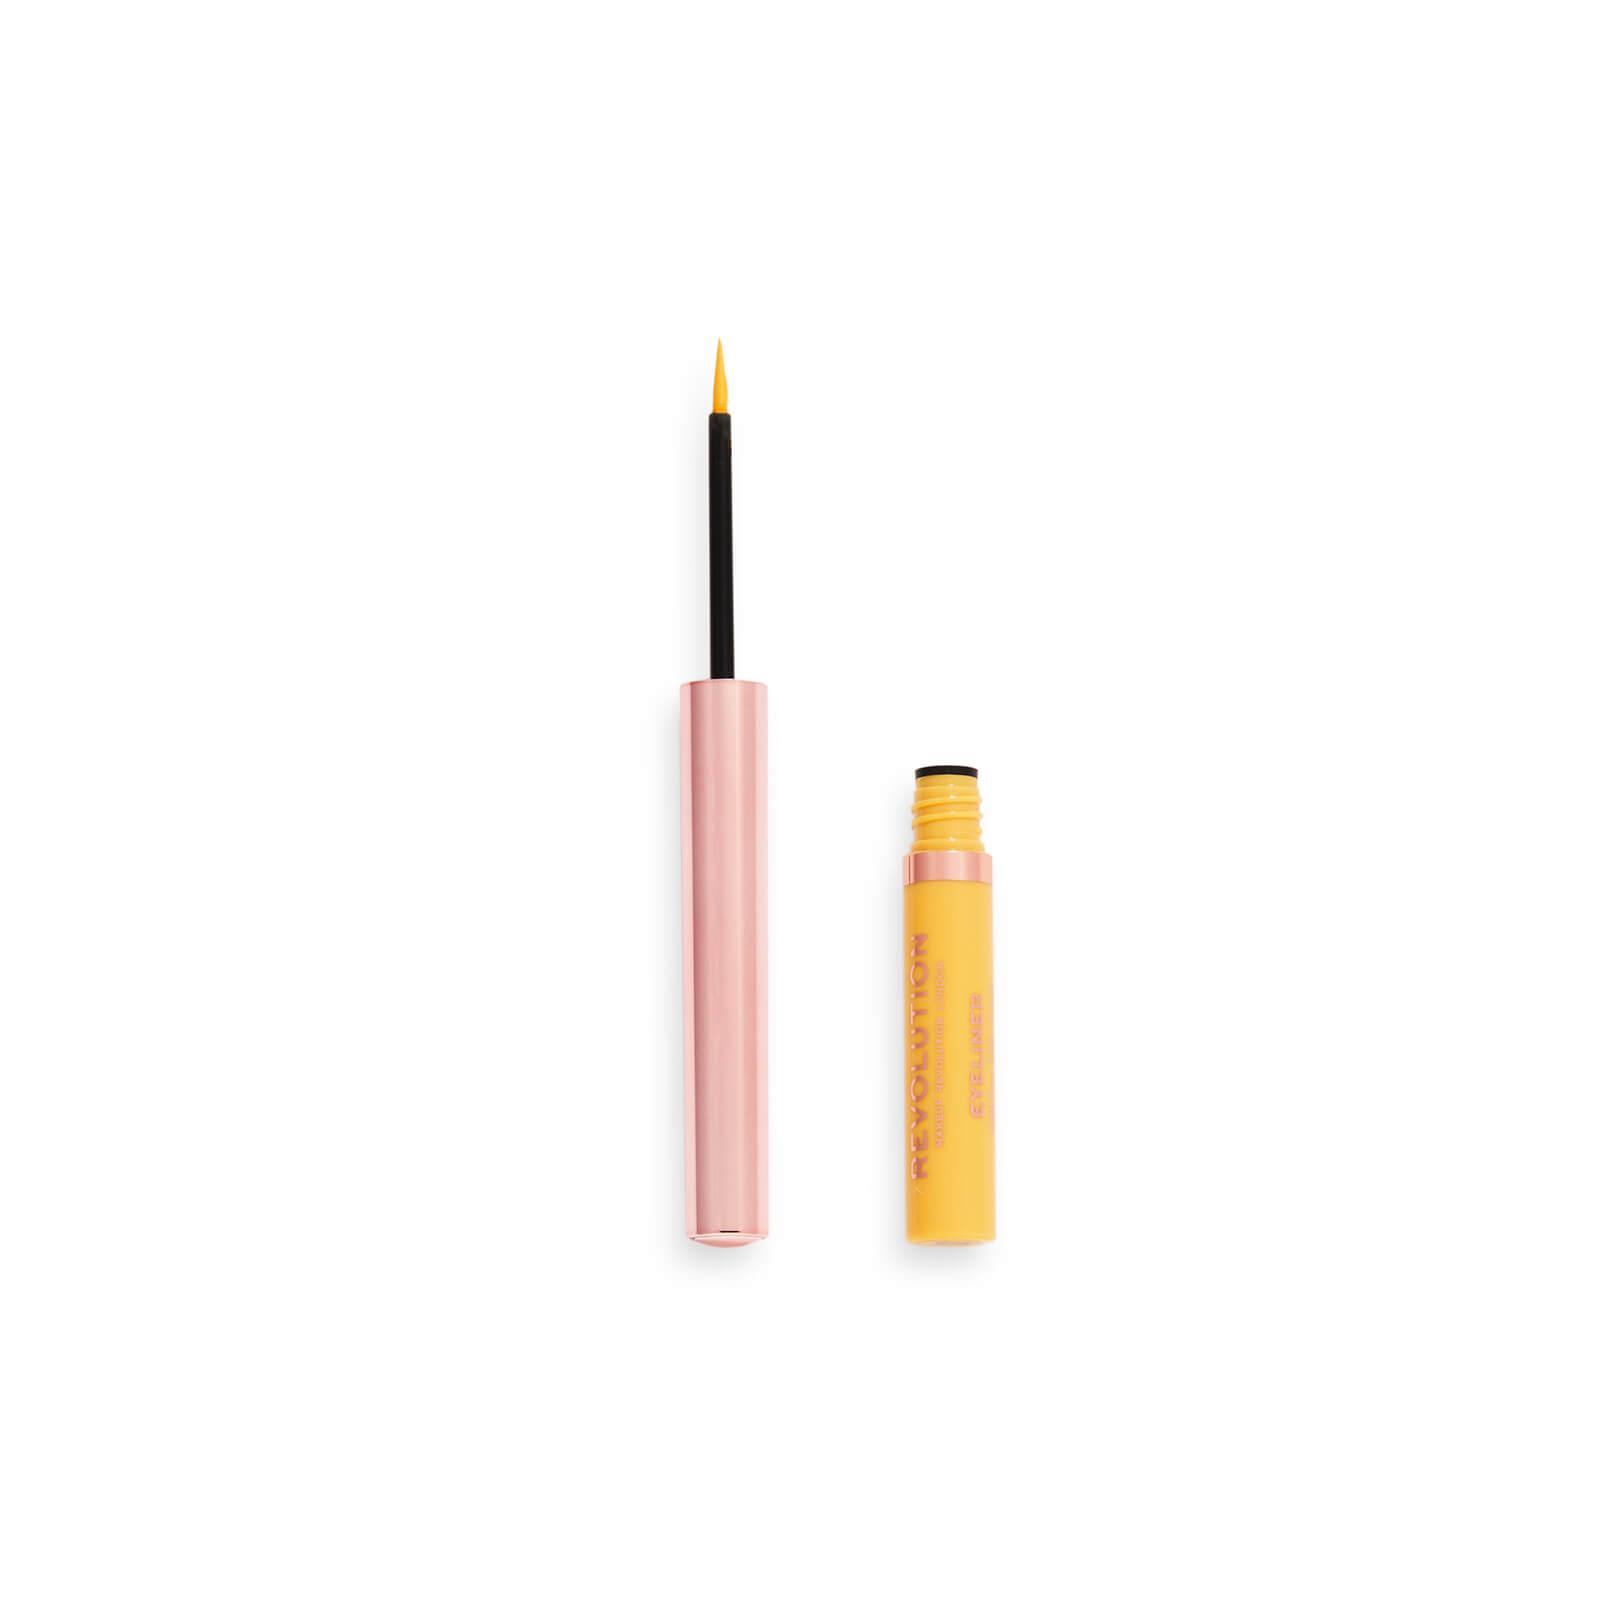 Купить Revolution Neon Heat Coloured Liquid Eyeliner 10g (Various Shades) - Lemon Yellow